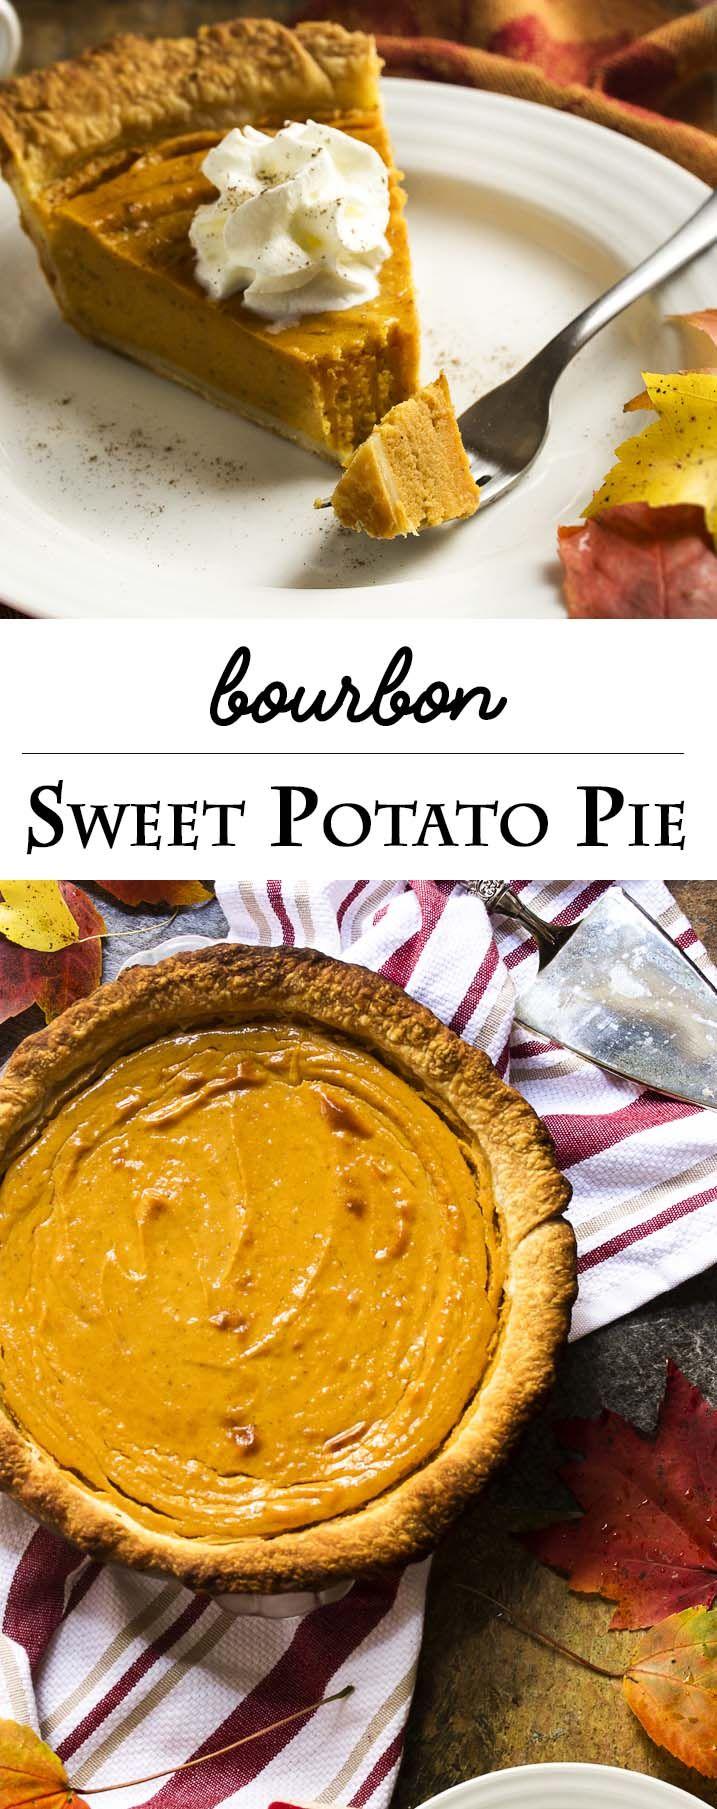 Bourbon Sweet Potato Pie | Recipe